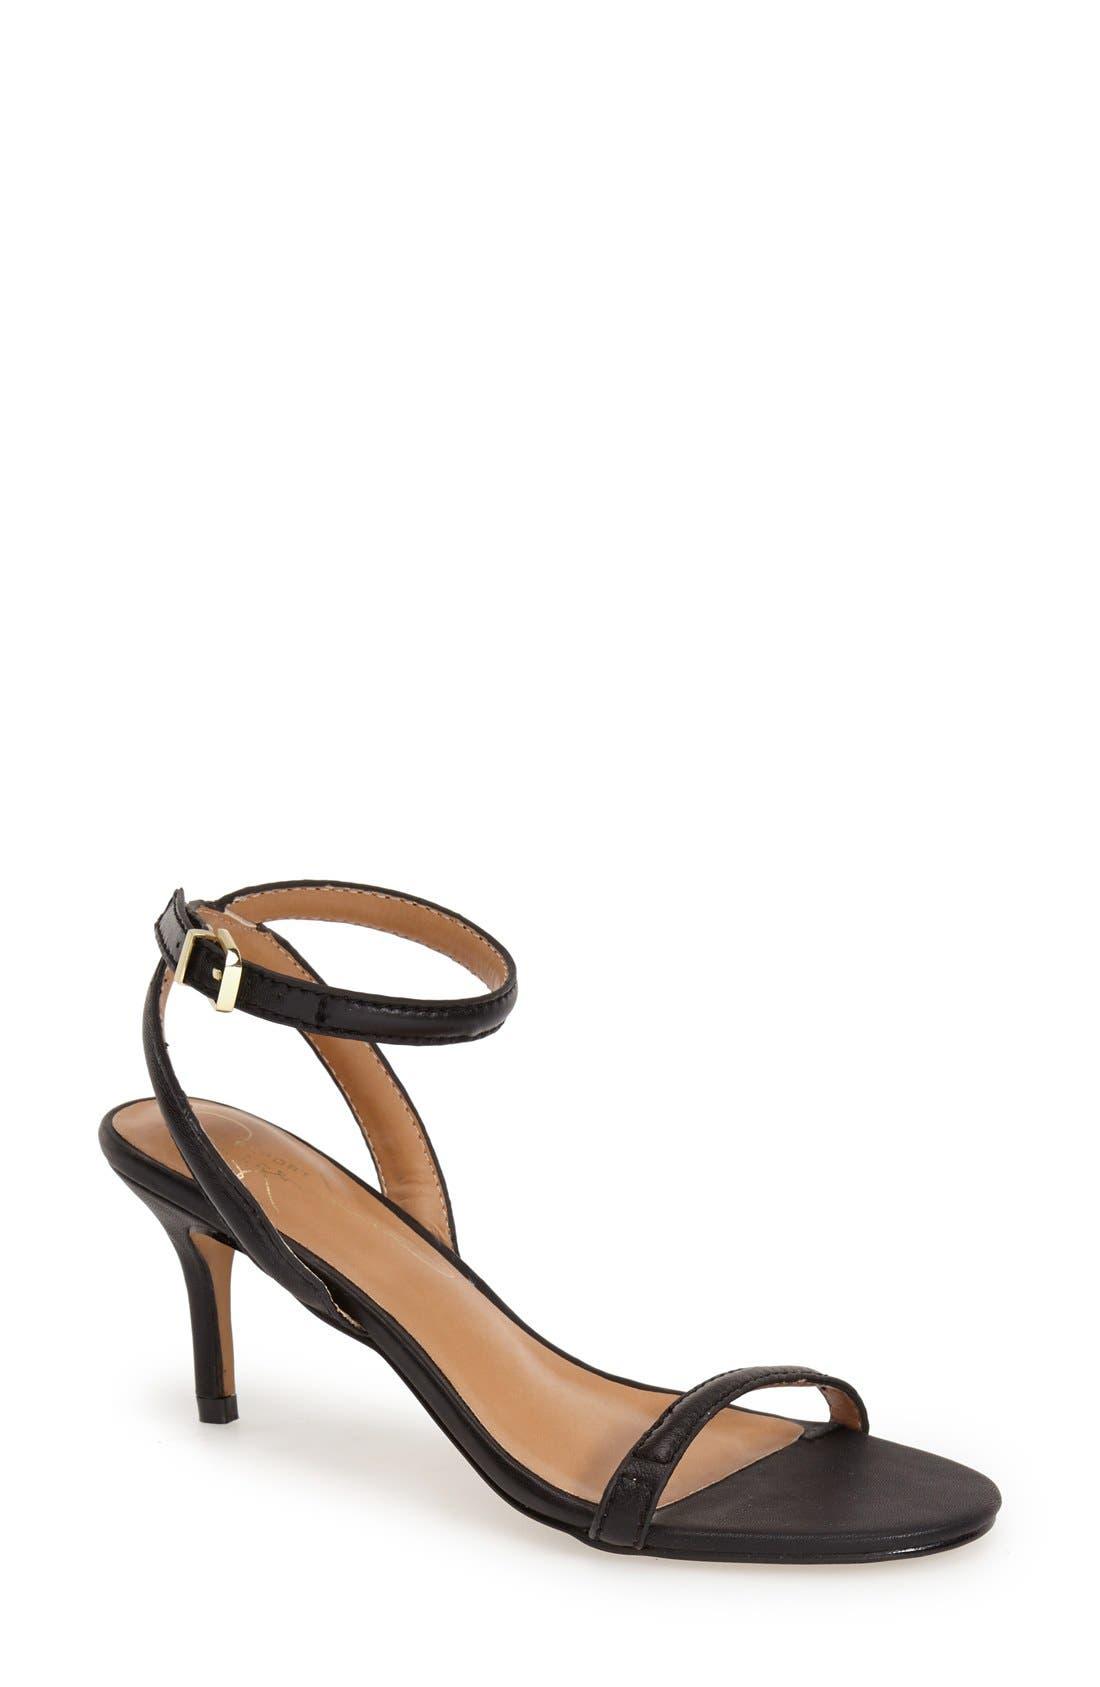 REPORT 'Signature Neely' Ankle Strap Sandal,                             Main thumbnail 1, color,                             001